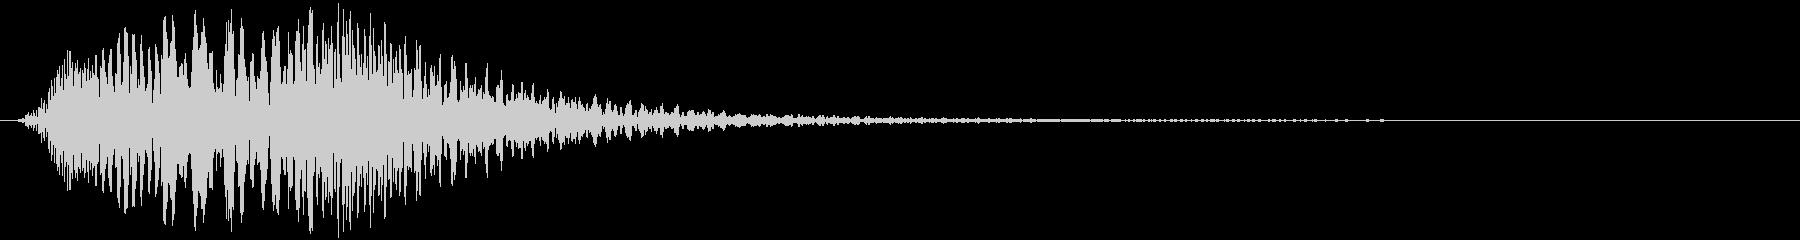 未来的・決定・選択・空気感・効果音17の未再生の波形